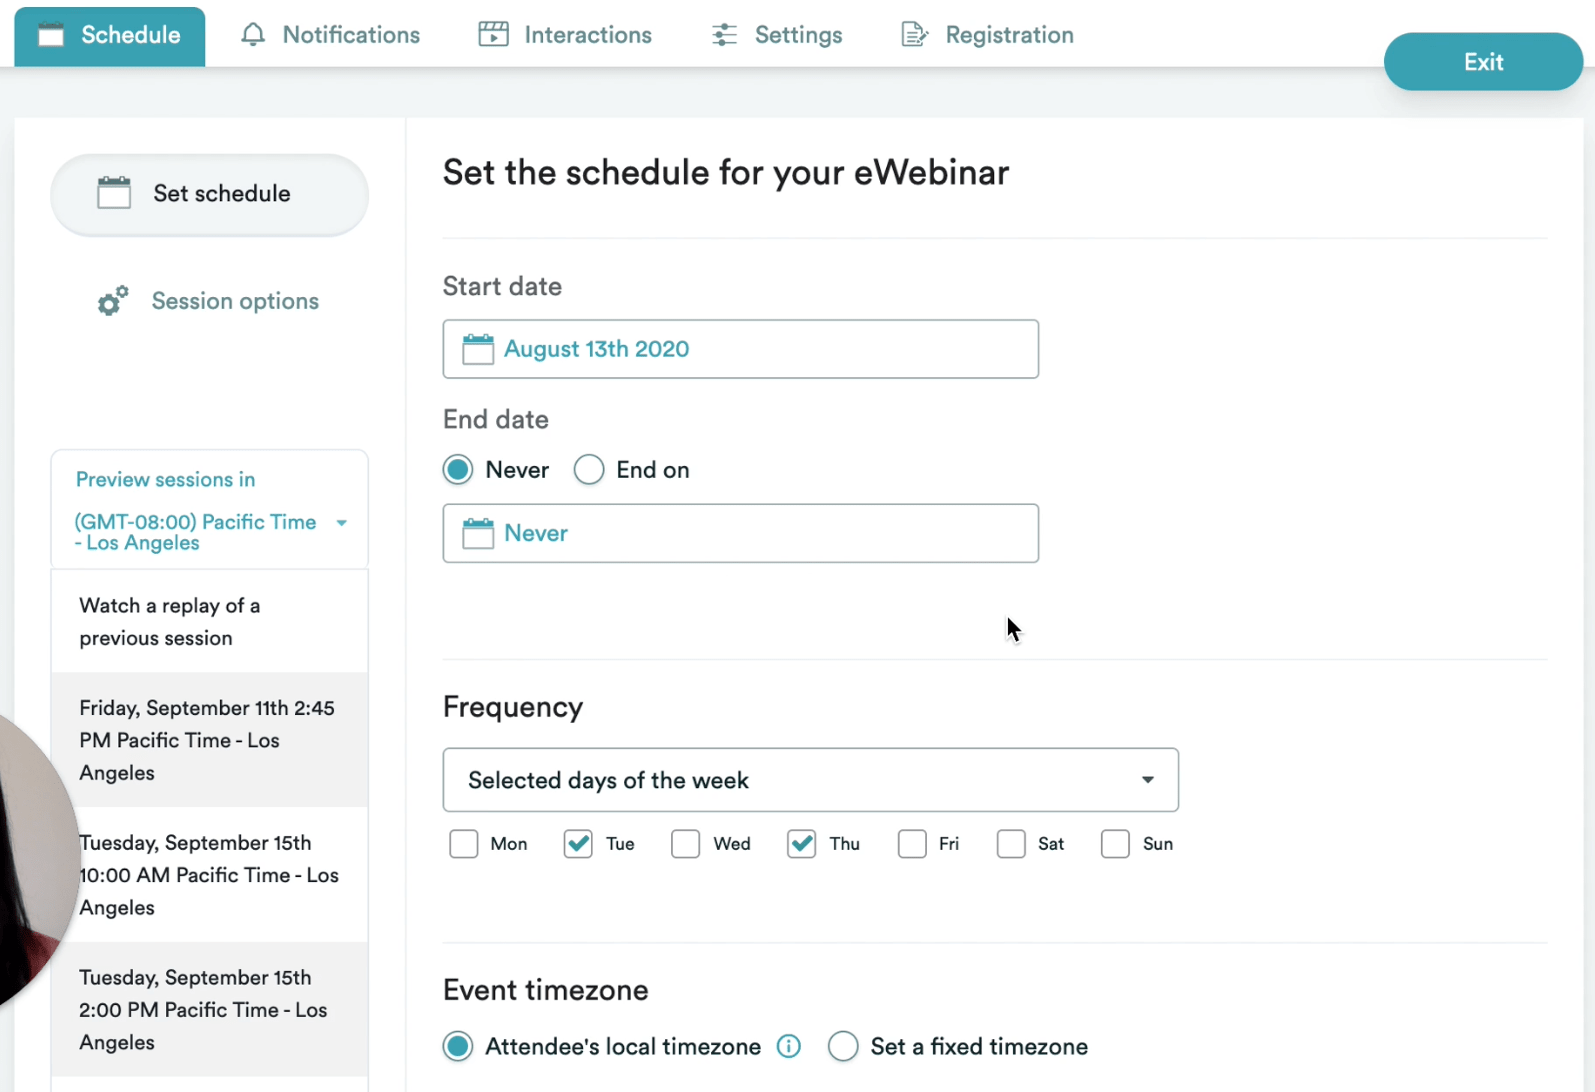 Automated webinar schedule customizations using eWebinar